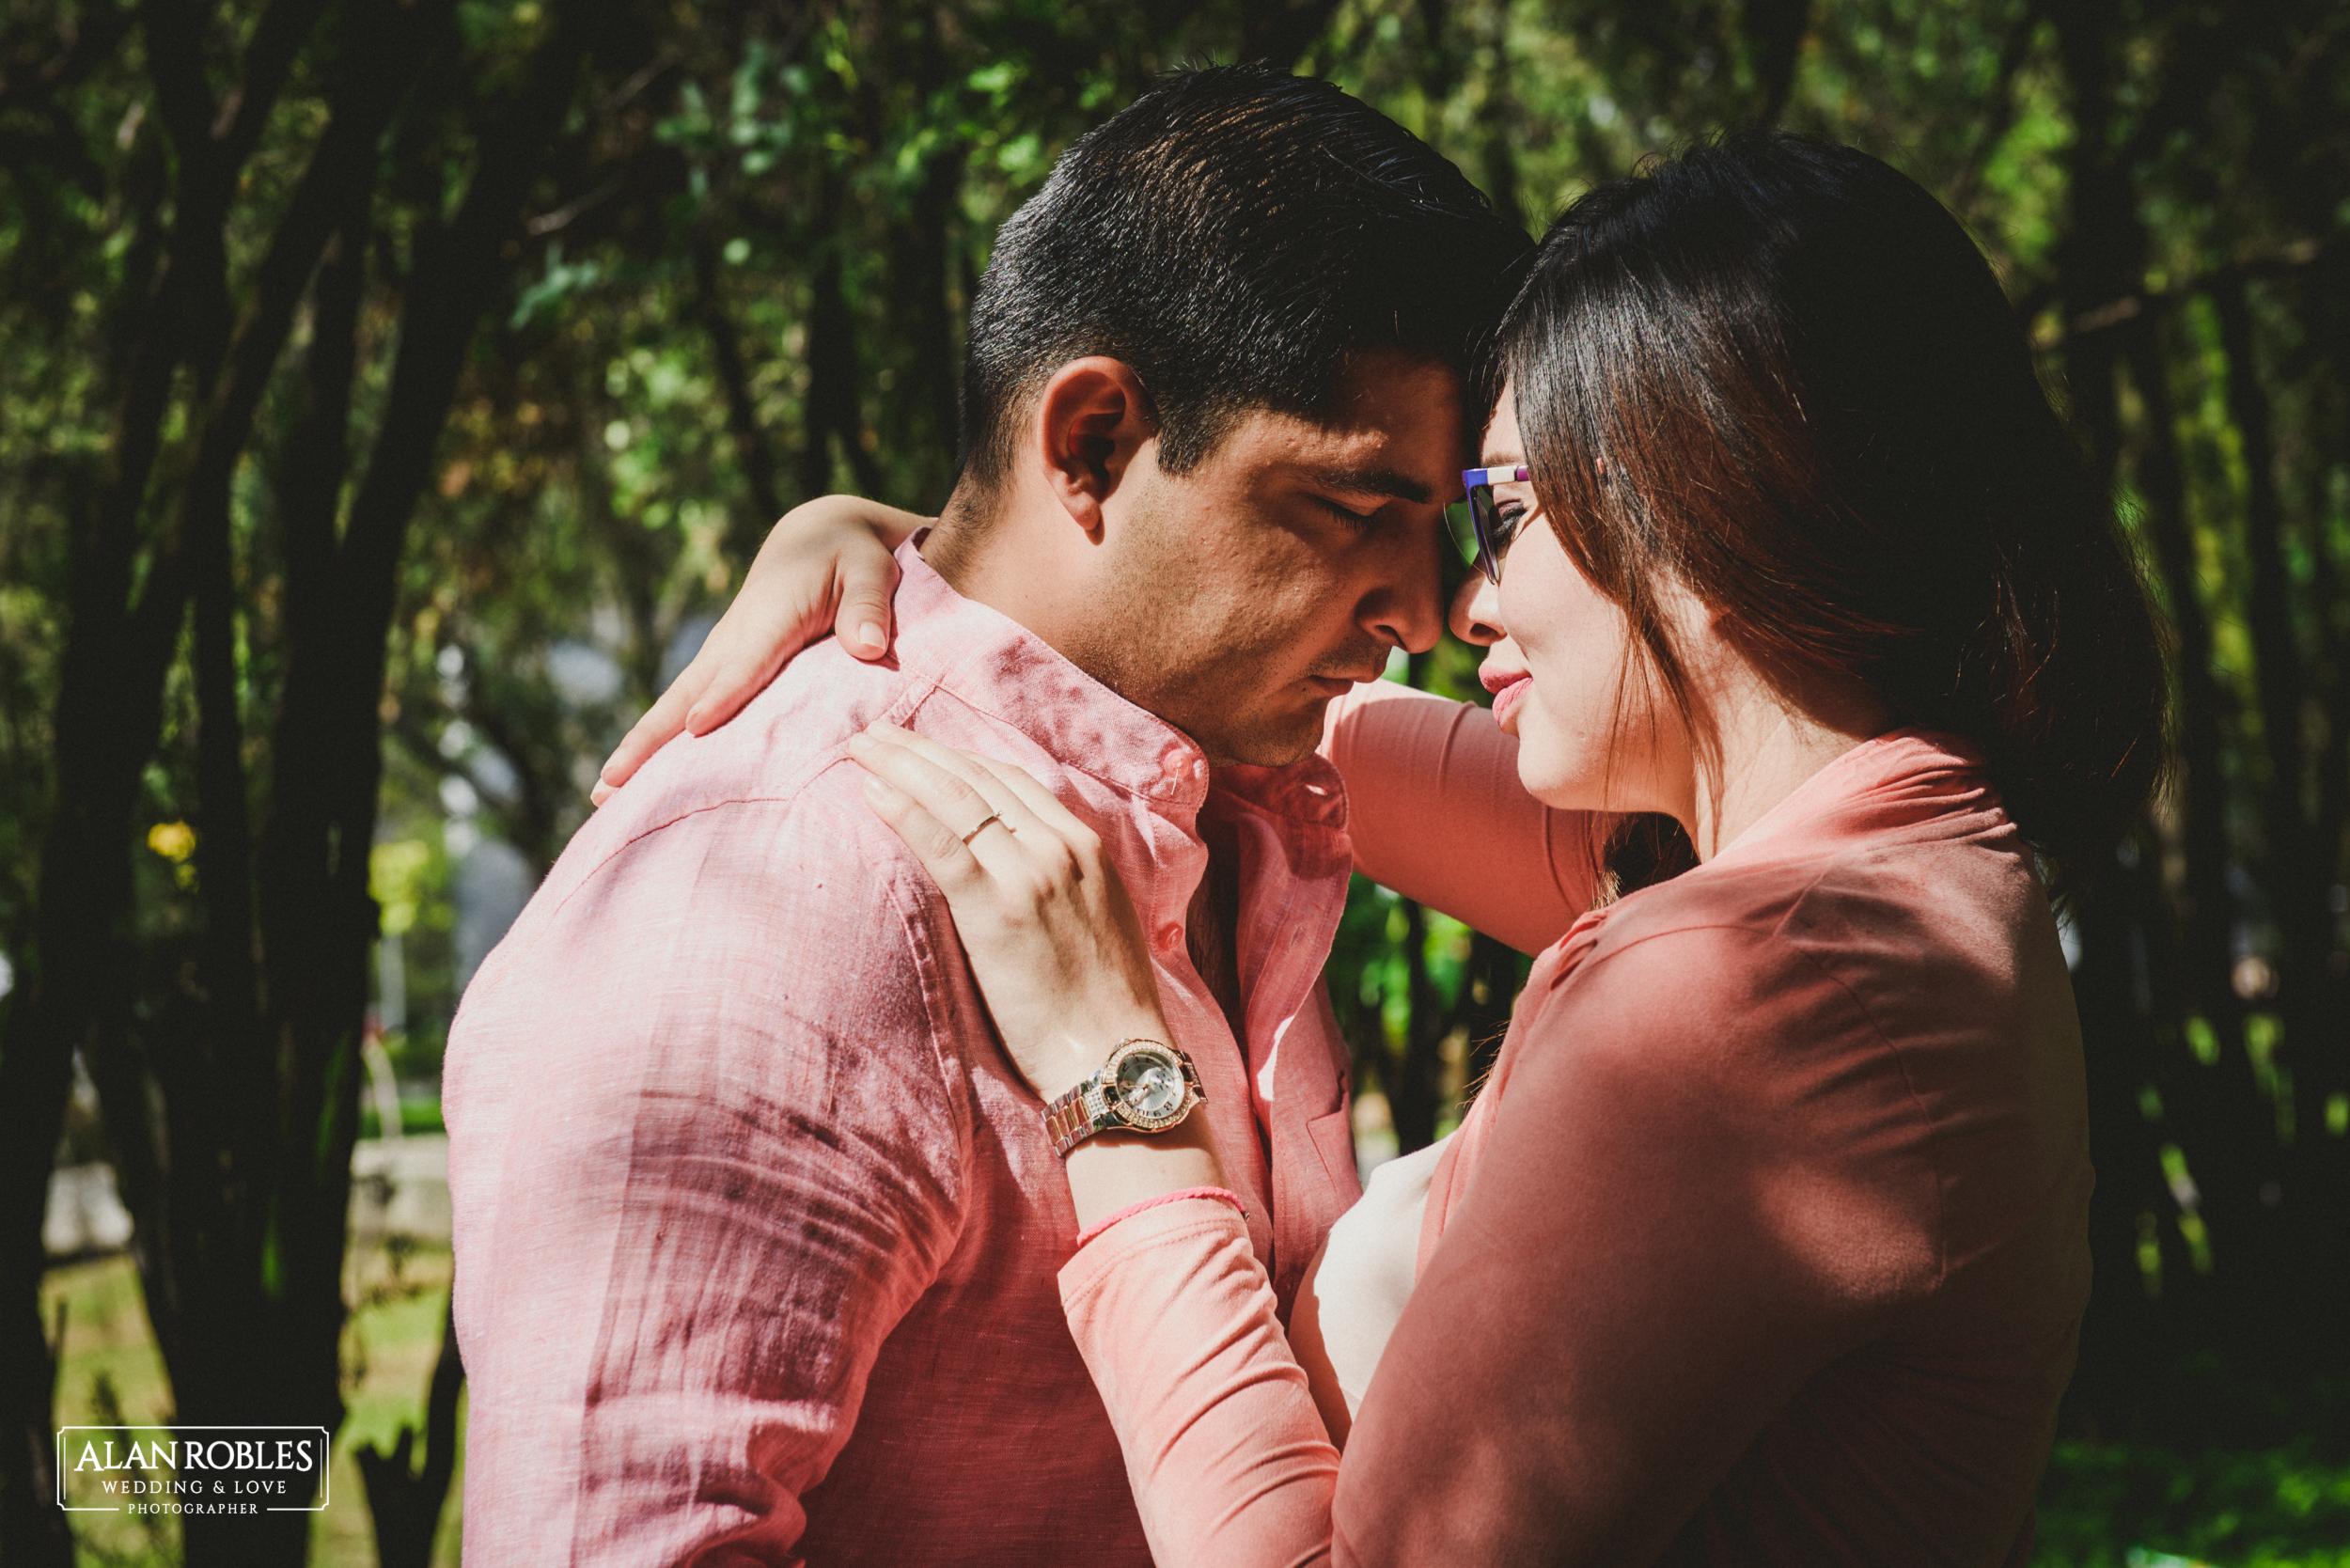 Sesion de amor - Alan Robles Fotografo de bodas en Guadalajara